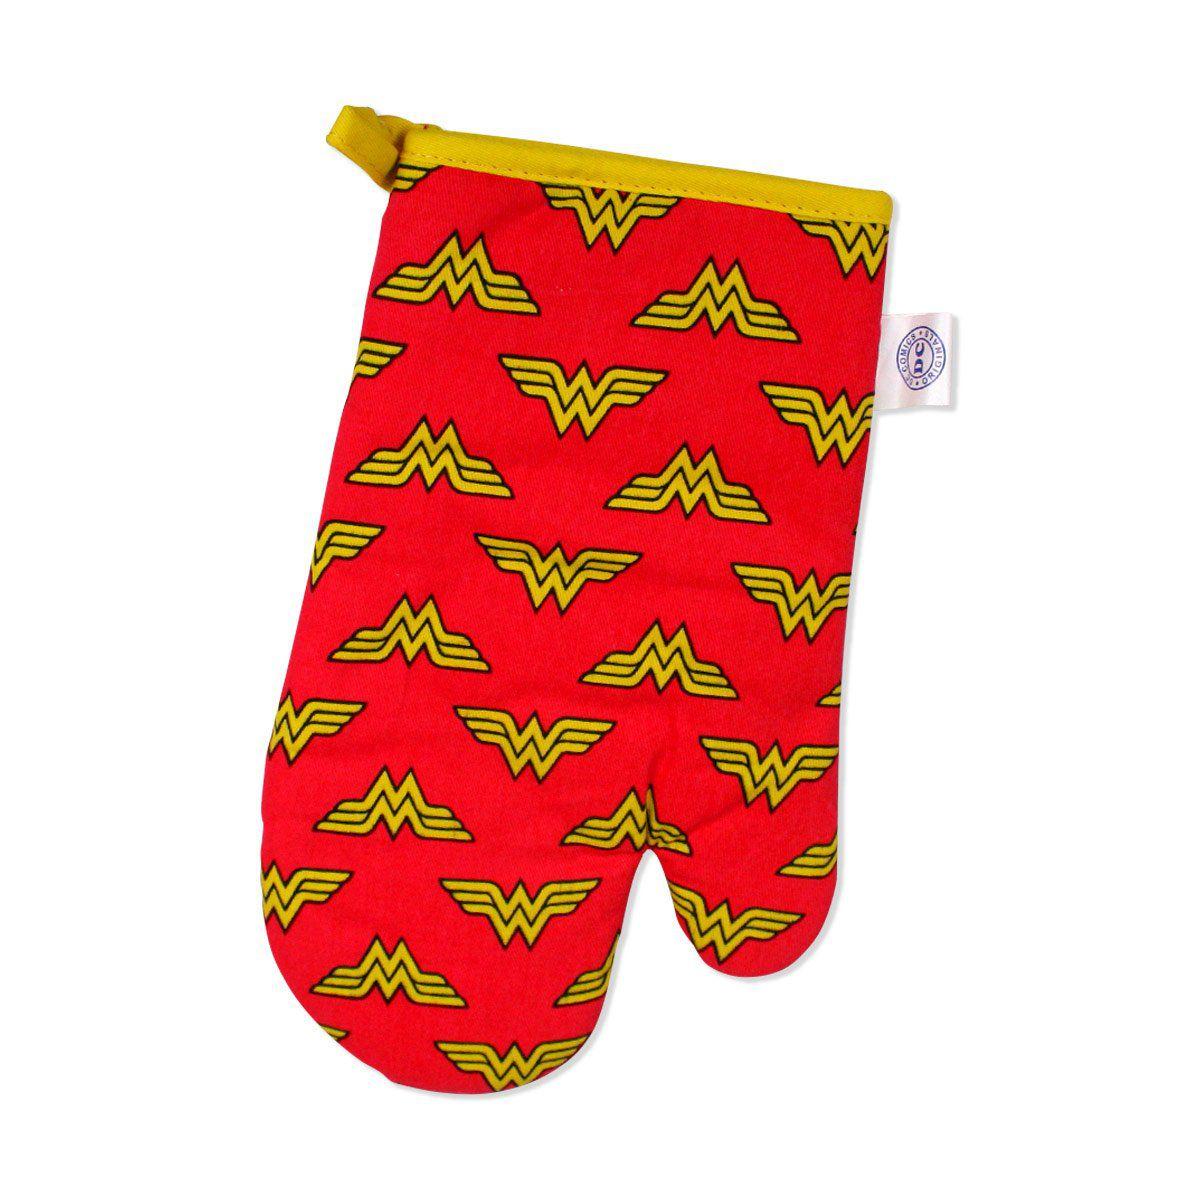 Luva de Forno Wonder Woman Logo  - bandUP Store Marketplace